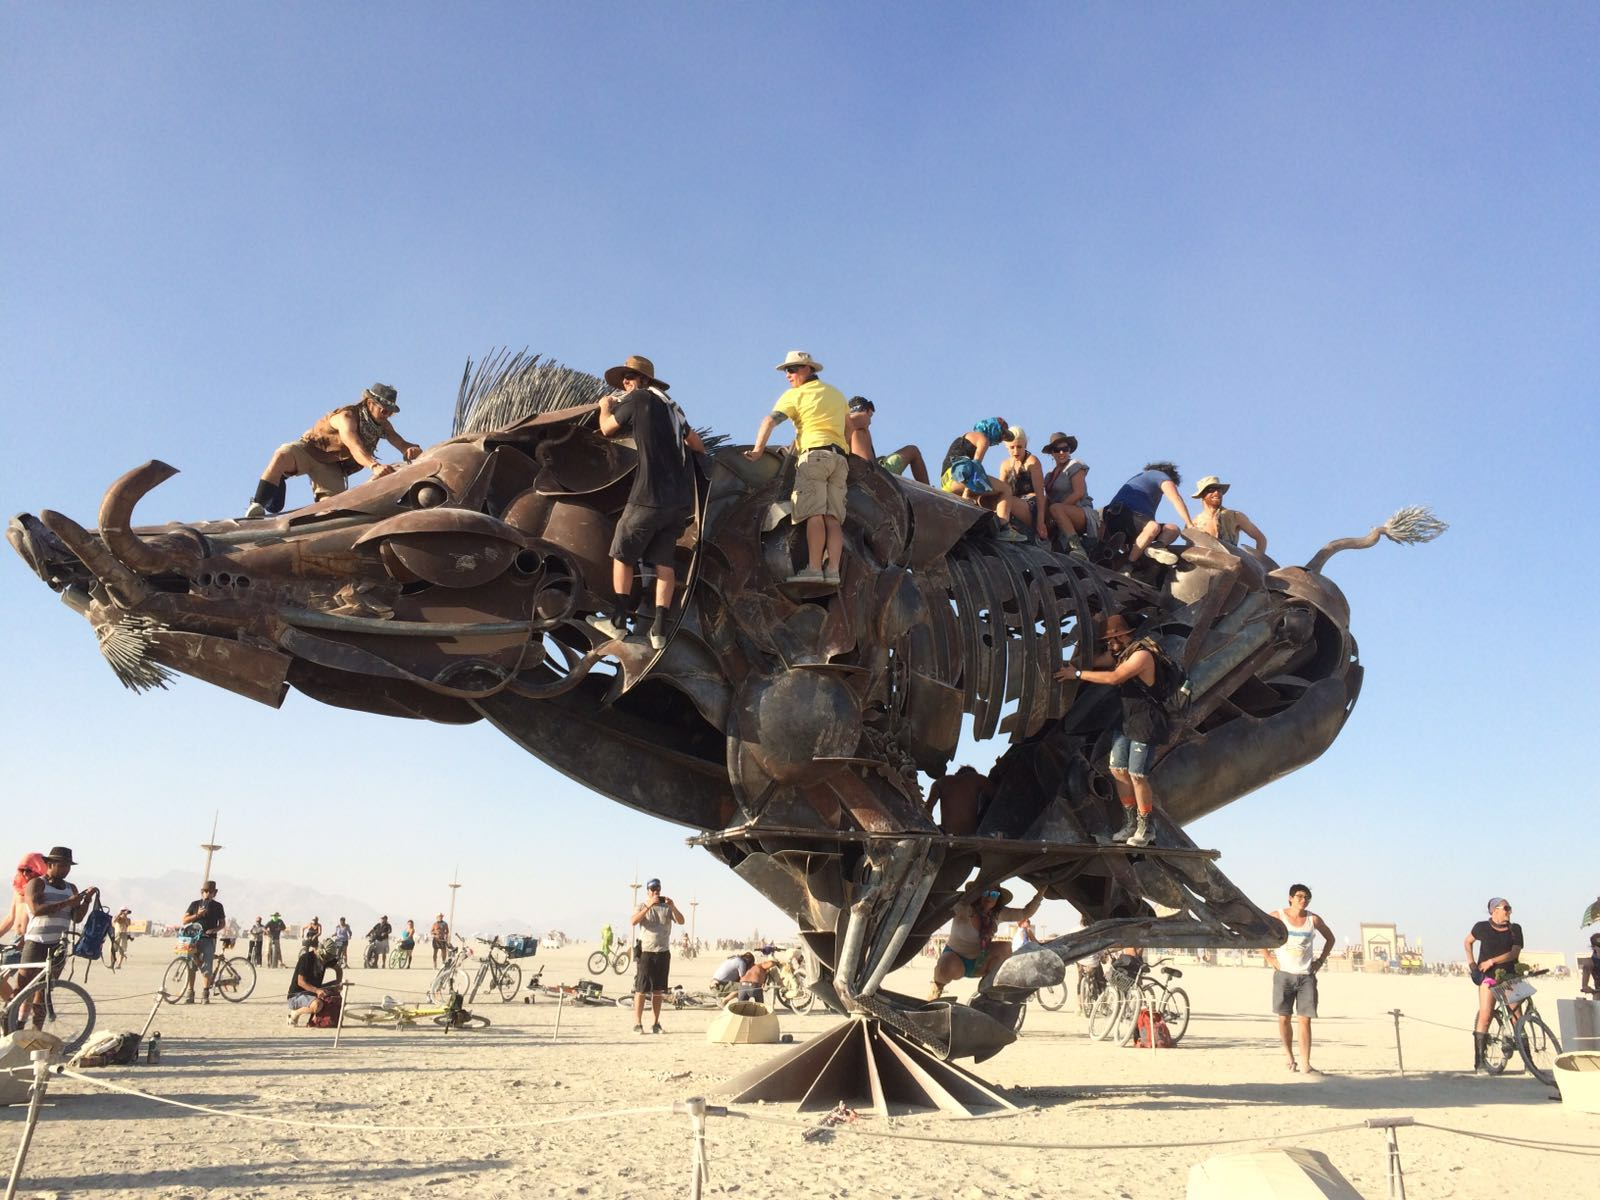 Burning Man art camping-car roadtrip